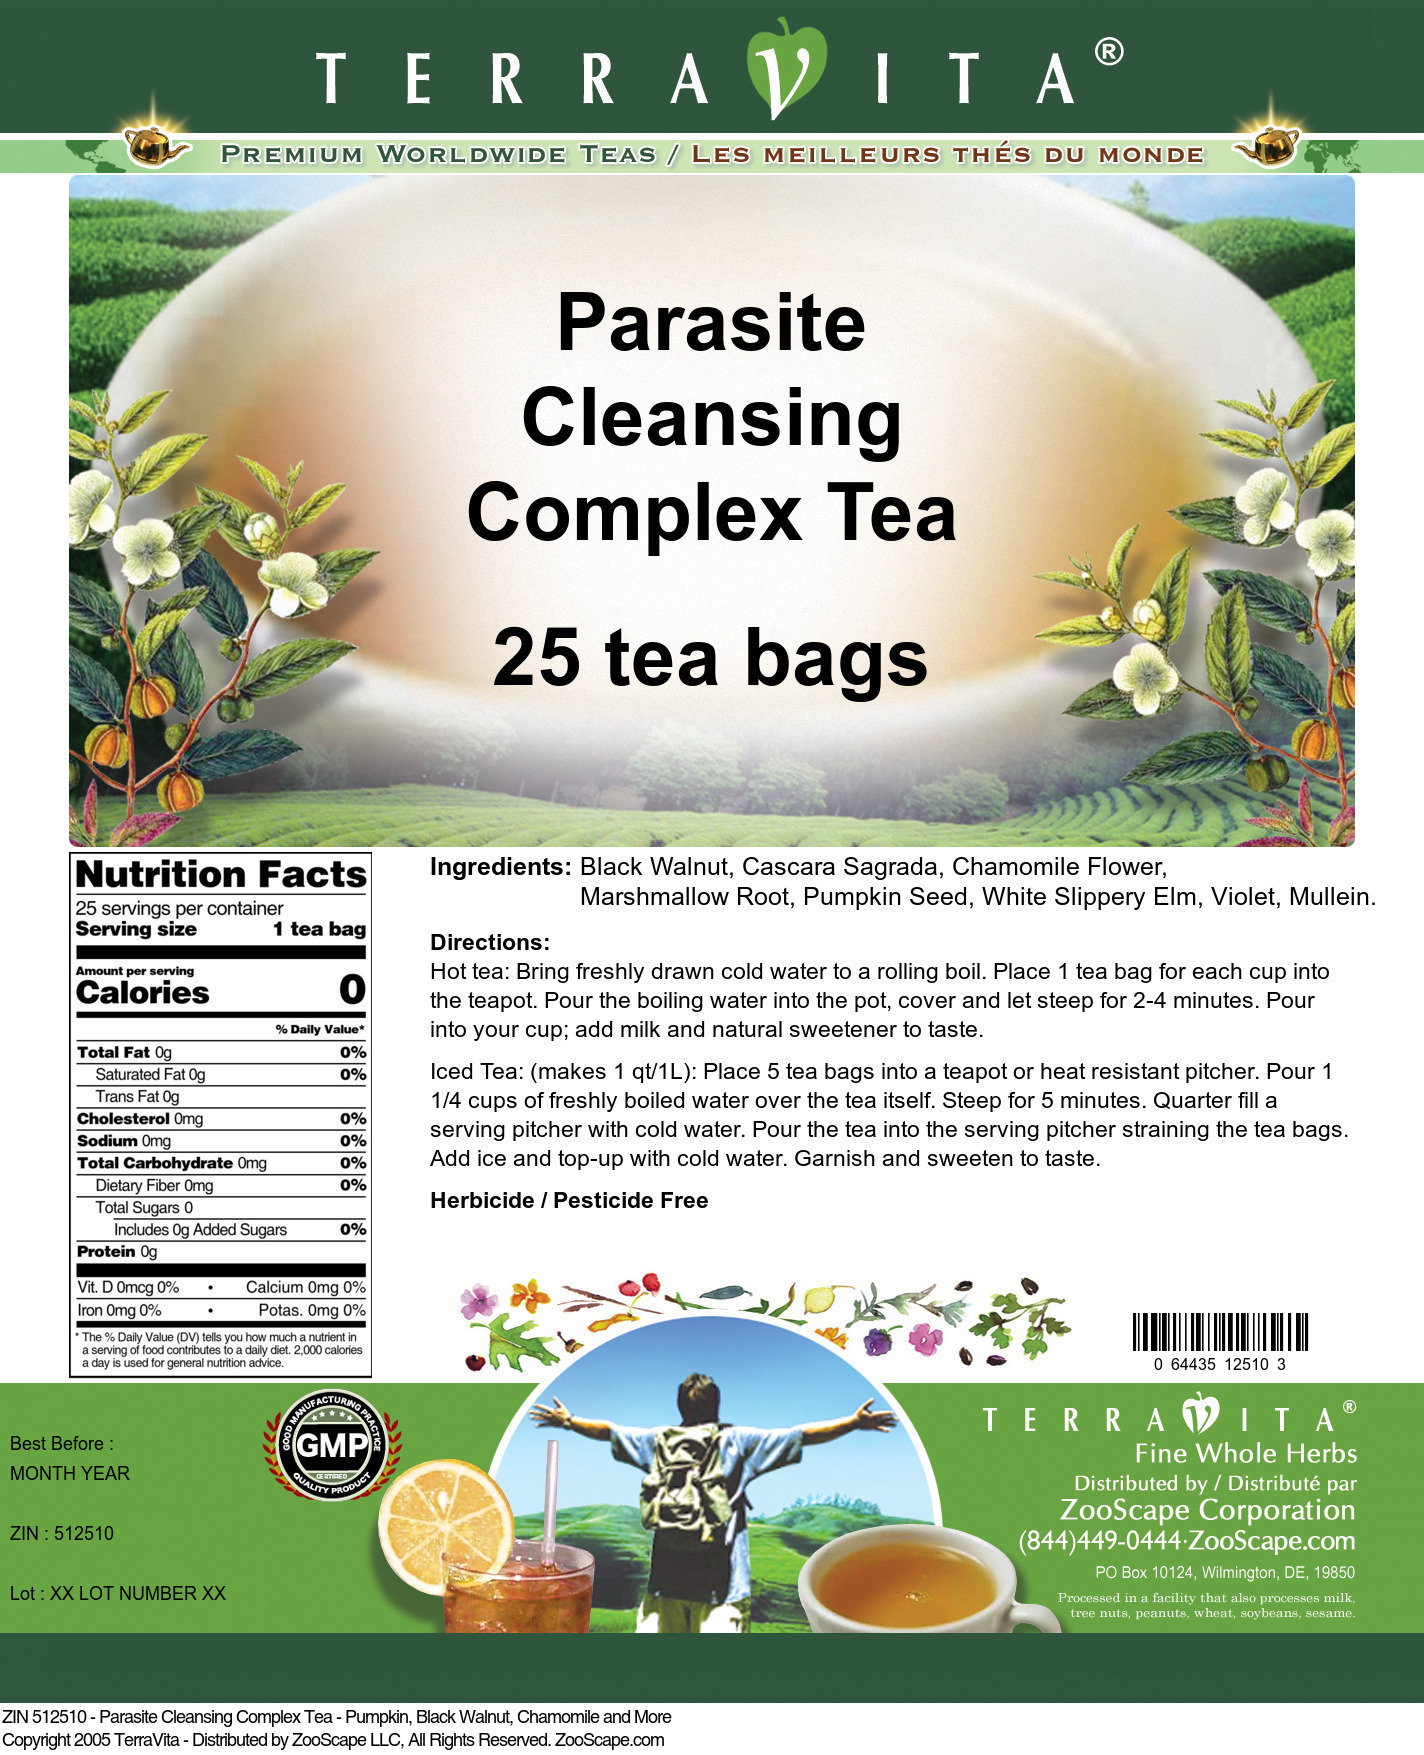 Parasite Cleansing Complex